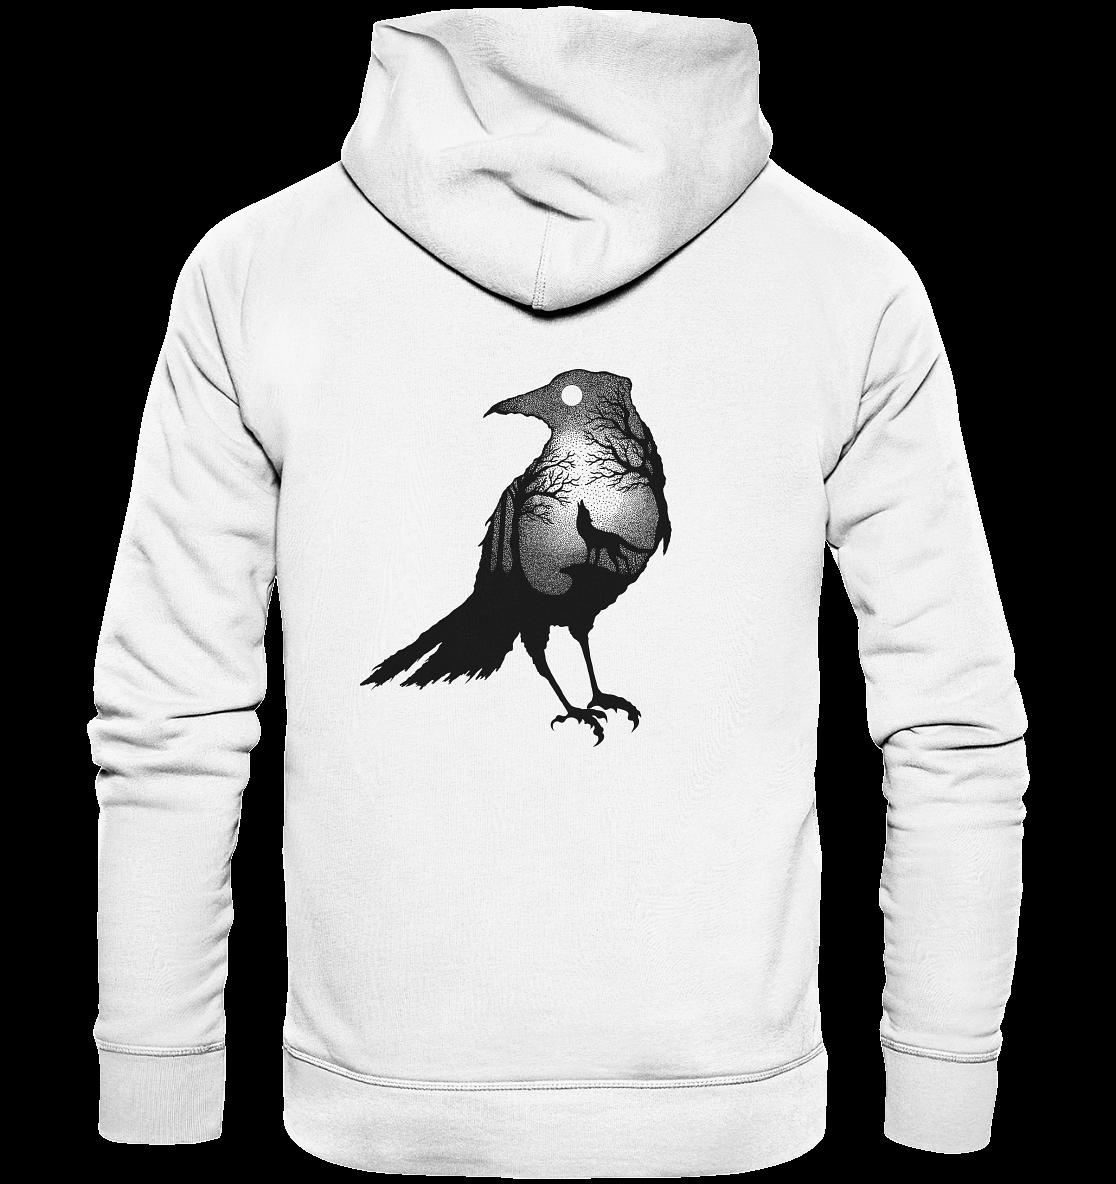 back-organic-hoodie-f8f8f8-1116x-2.png